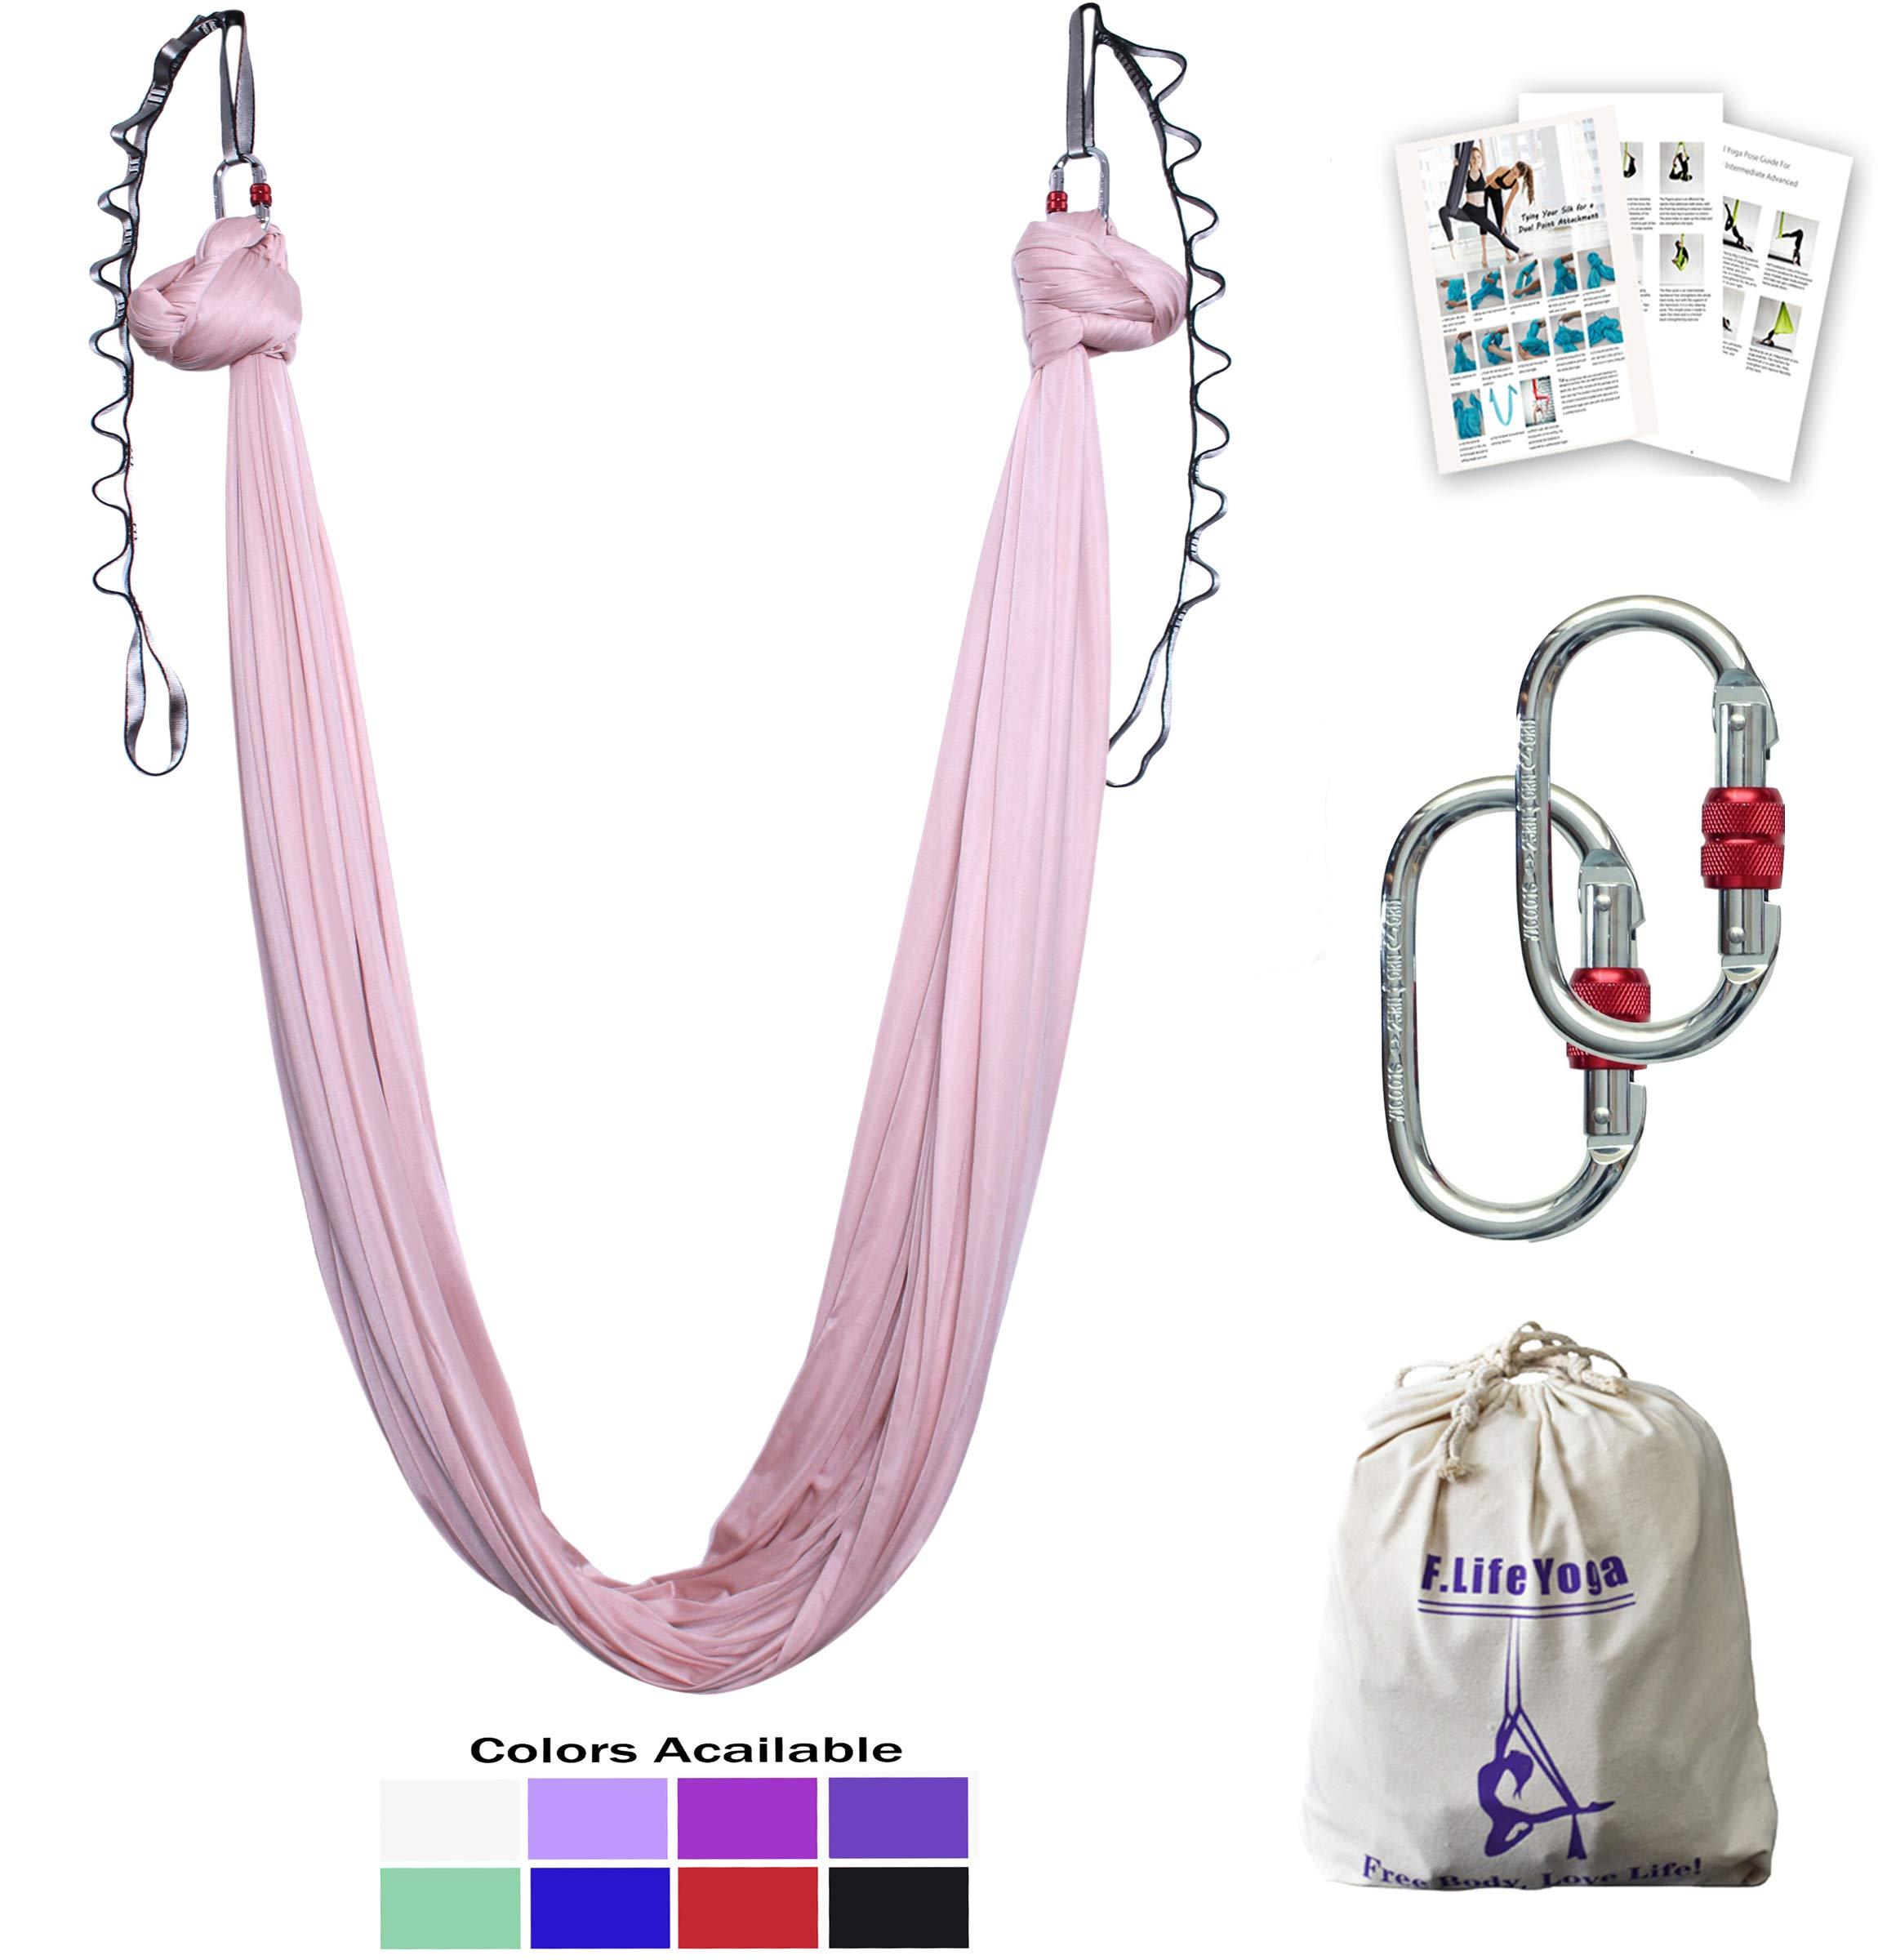 Aerial Yoga Hammock 5.5 Yards Premium Aerial Silk Fabric Yoga Swing for Antigravity Yoga Inversion Include Daisy Chain,Carabiner and Pose Guide (Blush Nude)